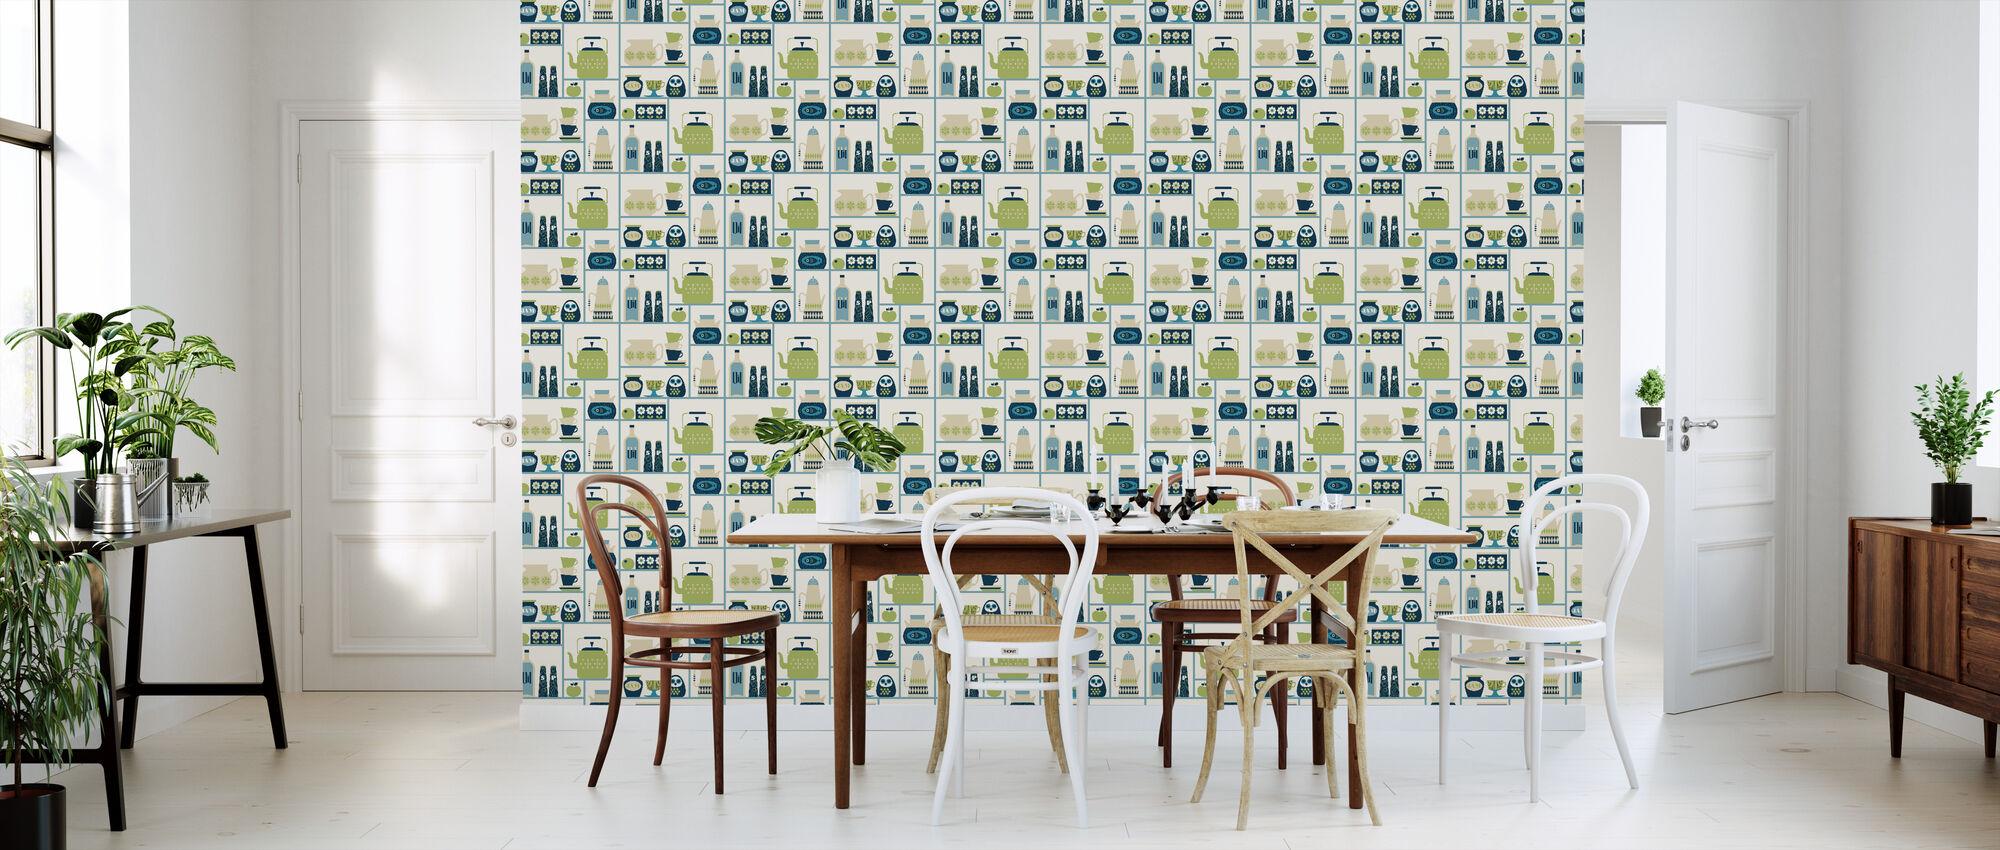 Kitchen Shelves - Light Green - Wallpaper - Kitchen